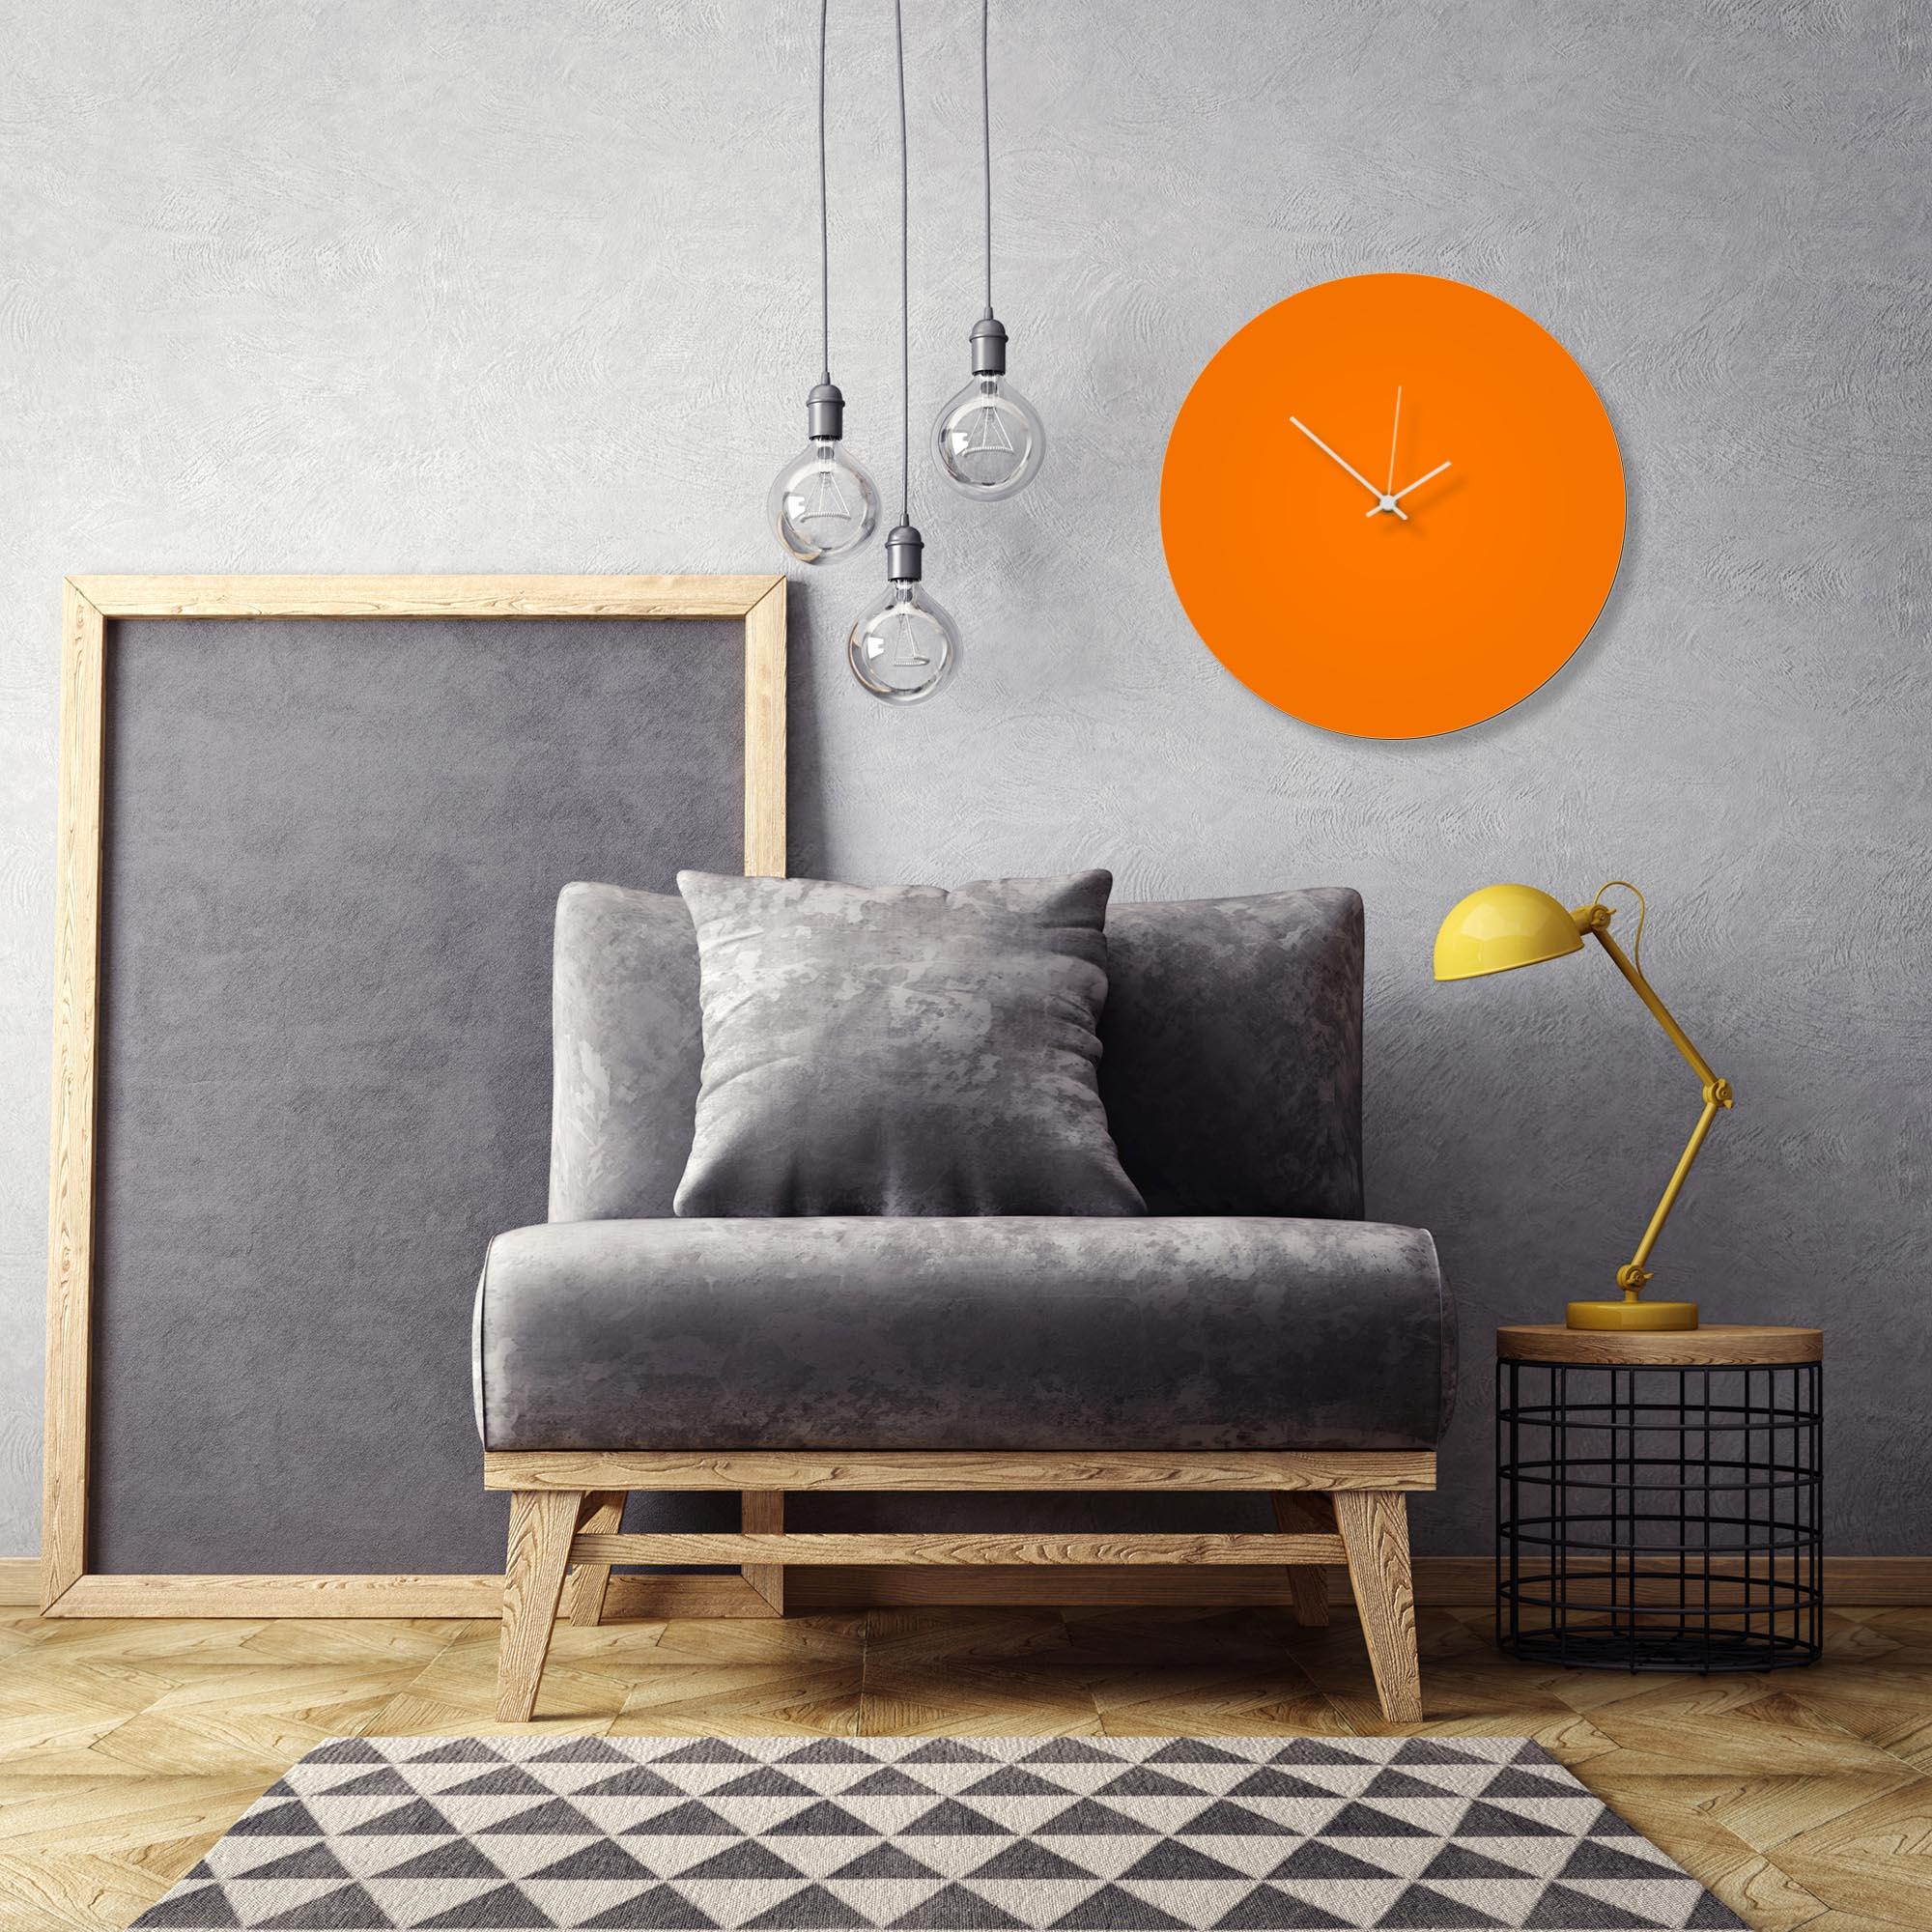 Orangeout White Circle Clock Large by Adam Schwoeppe Contemporary Clock on Aluminum Polymetal - Alternate View 1